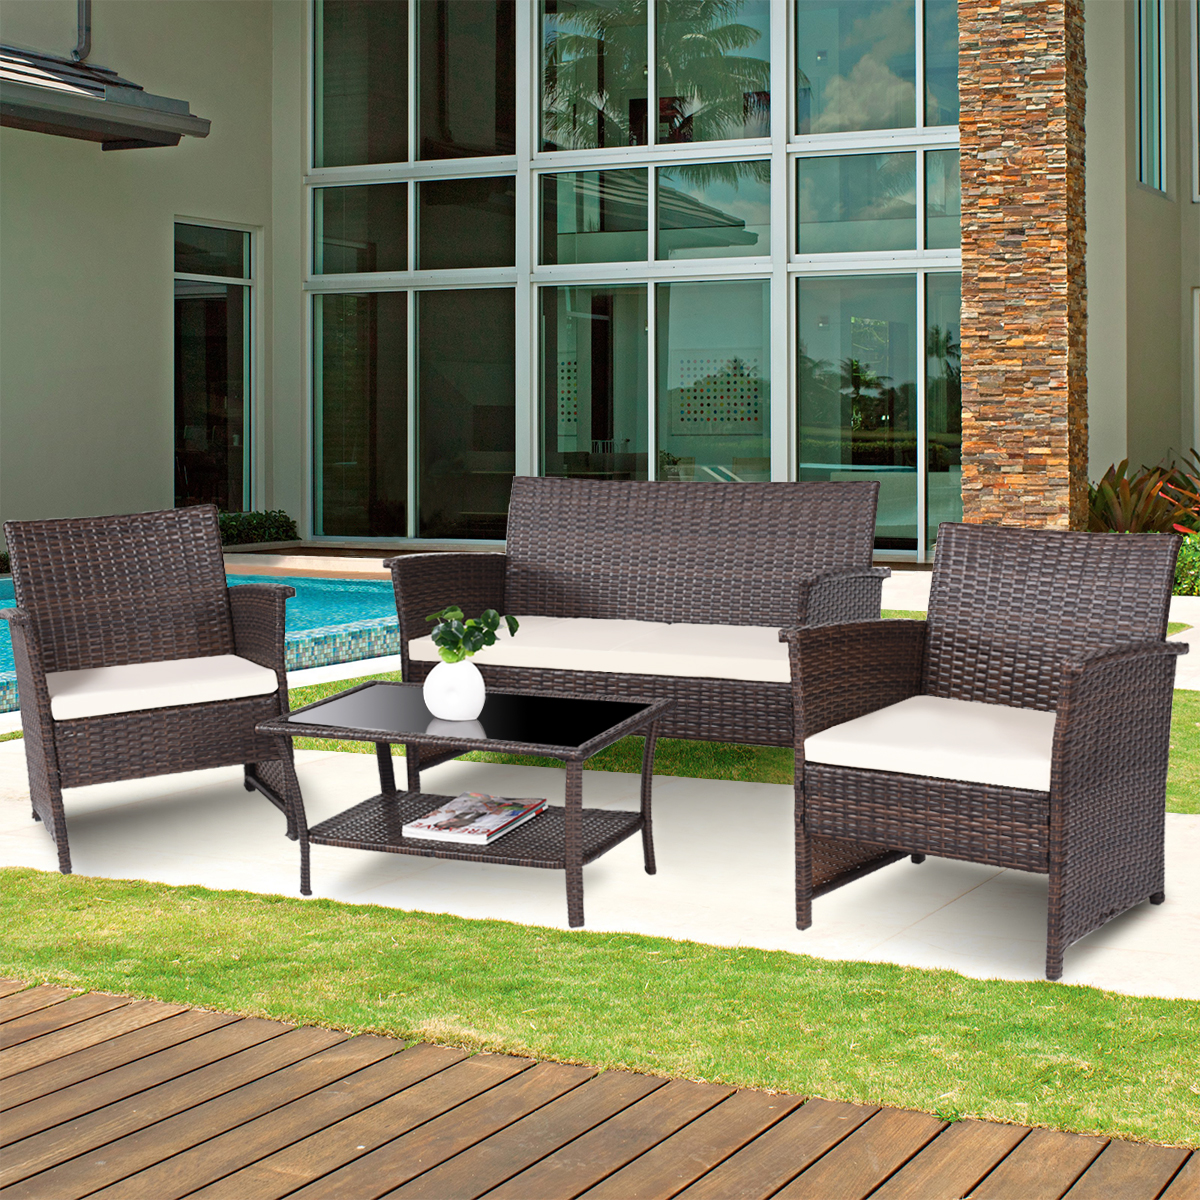 Costway 4 PCS Outdoor Patio Rattan Furniture Set Rattan ... on Outdoor Loveseat Sets  id=76114